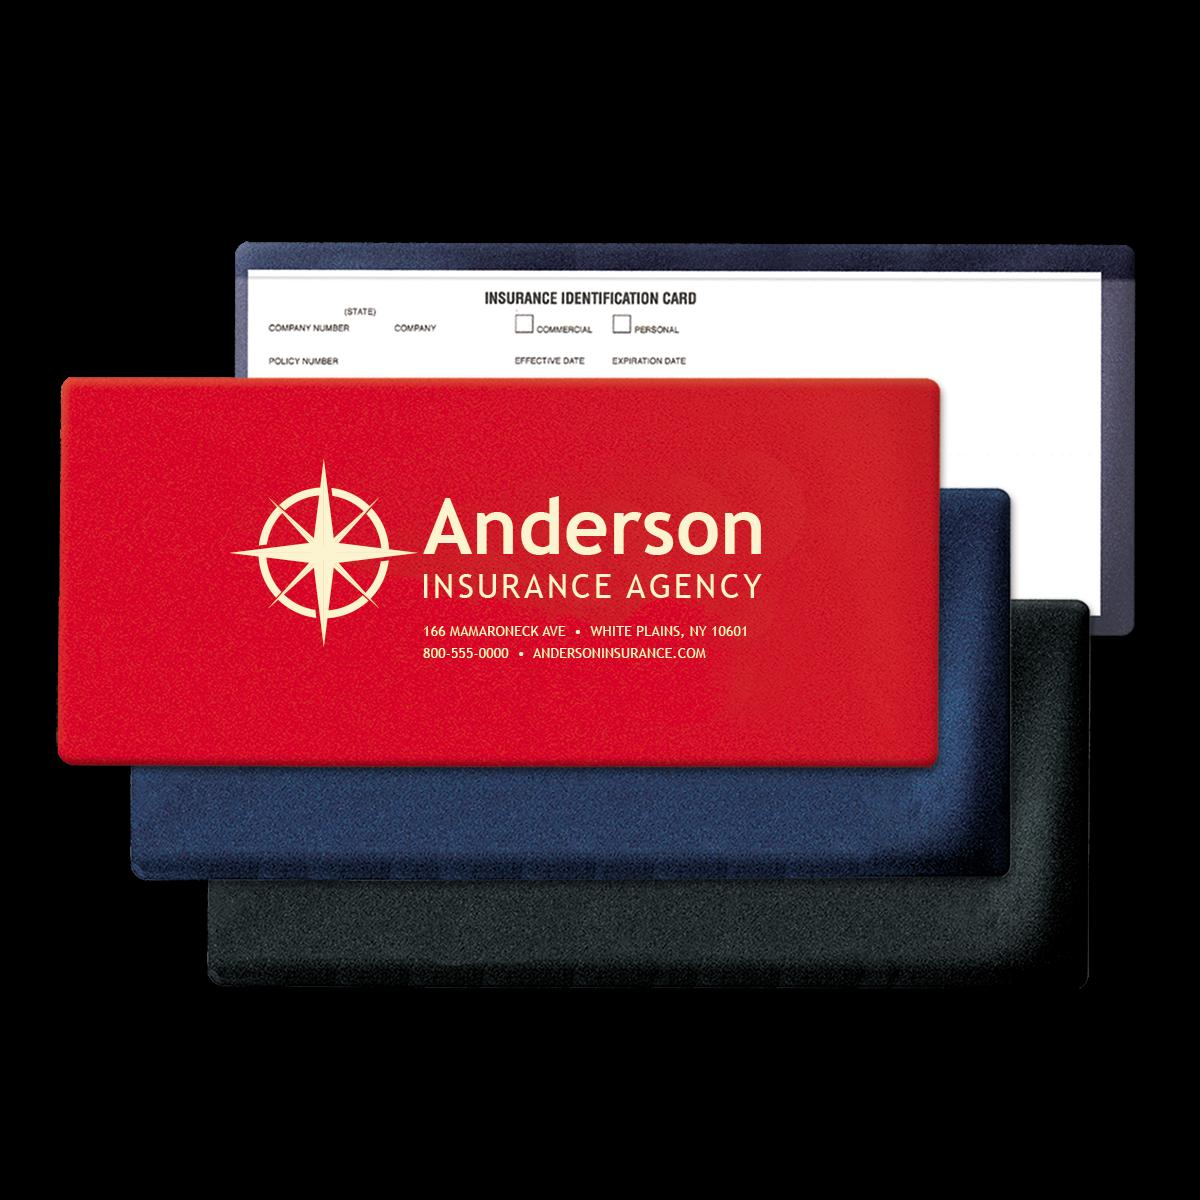 Insurance: Auto Insurance Insurance Card